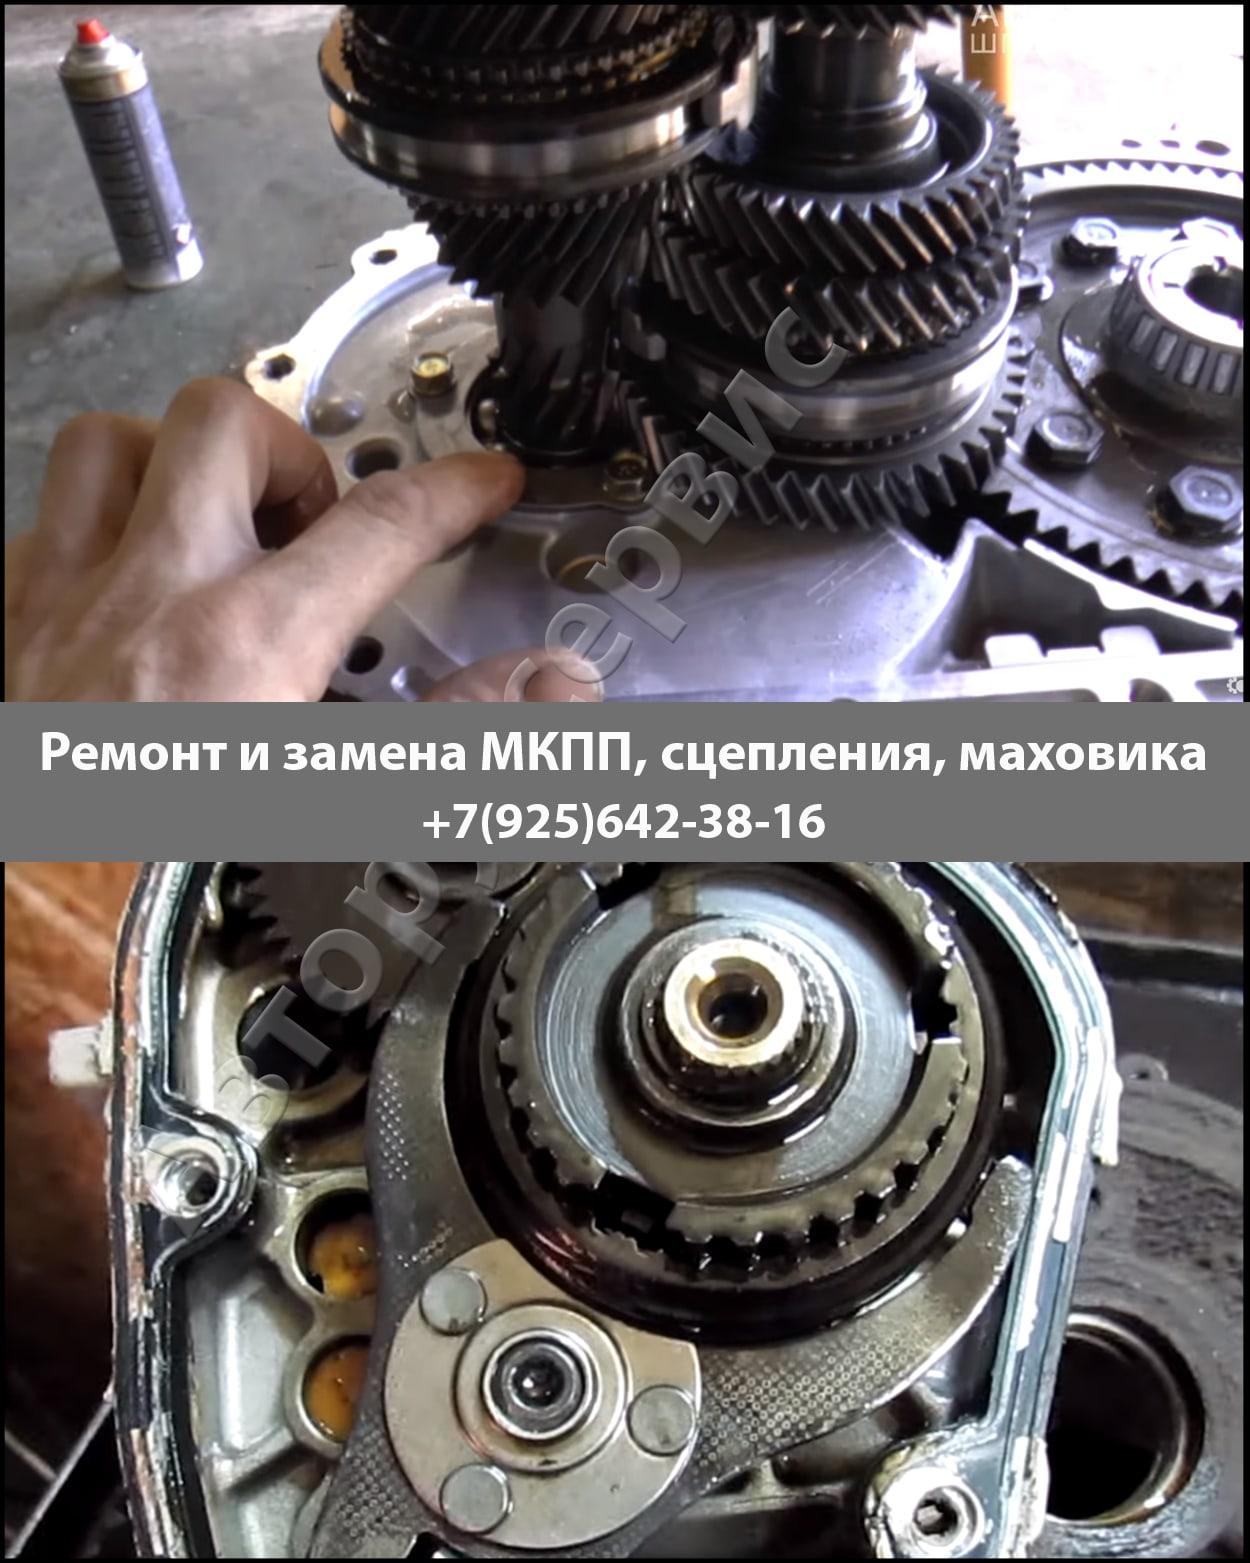 Ремонт МКПП Амарок